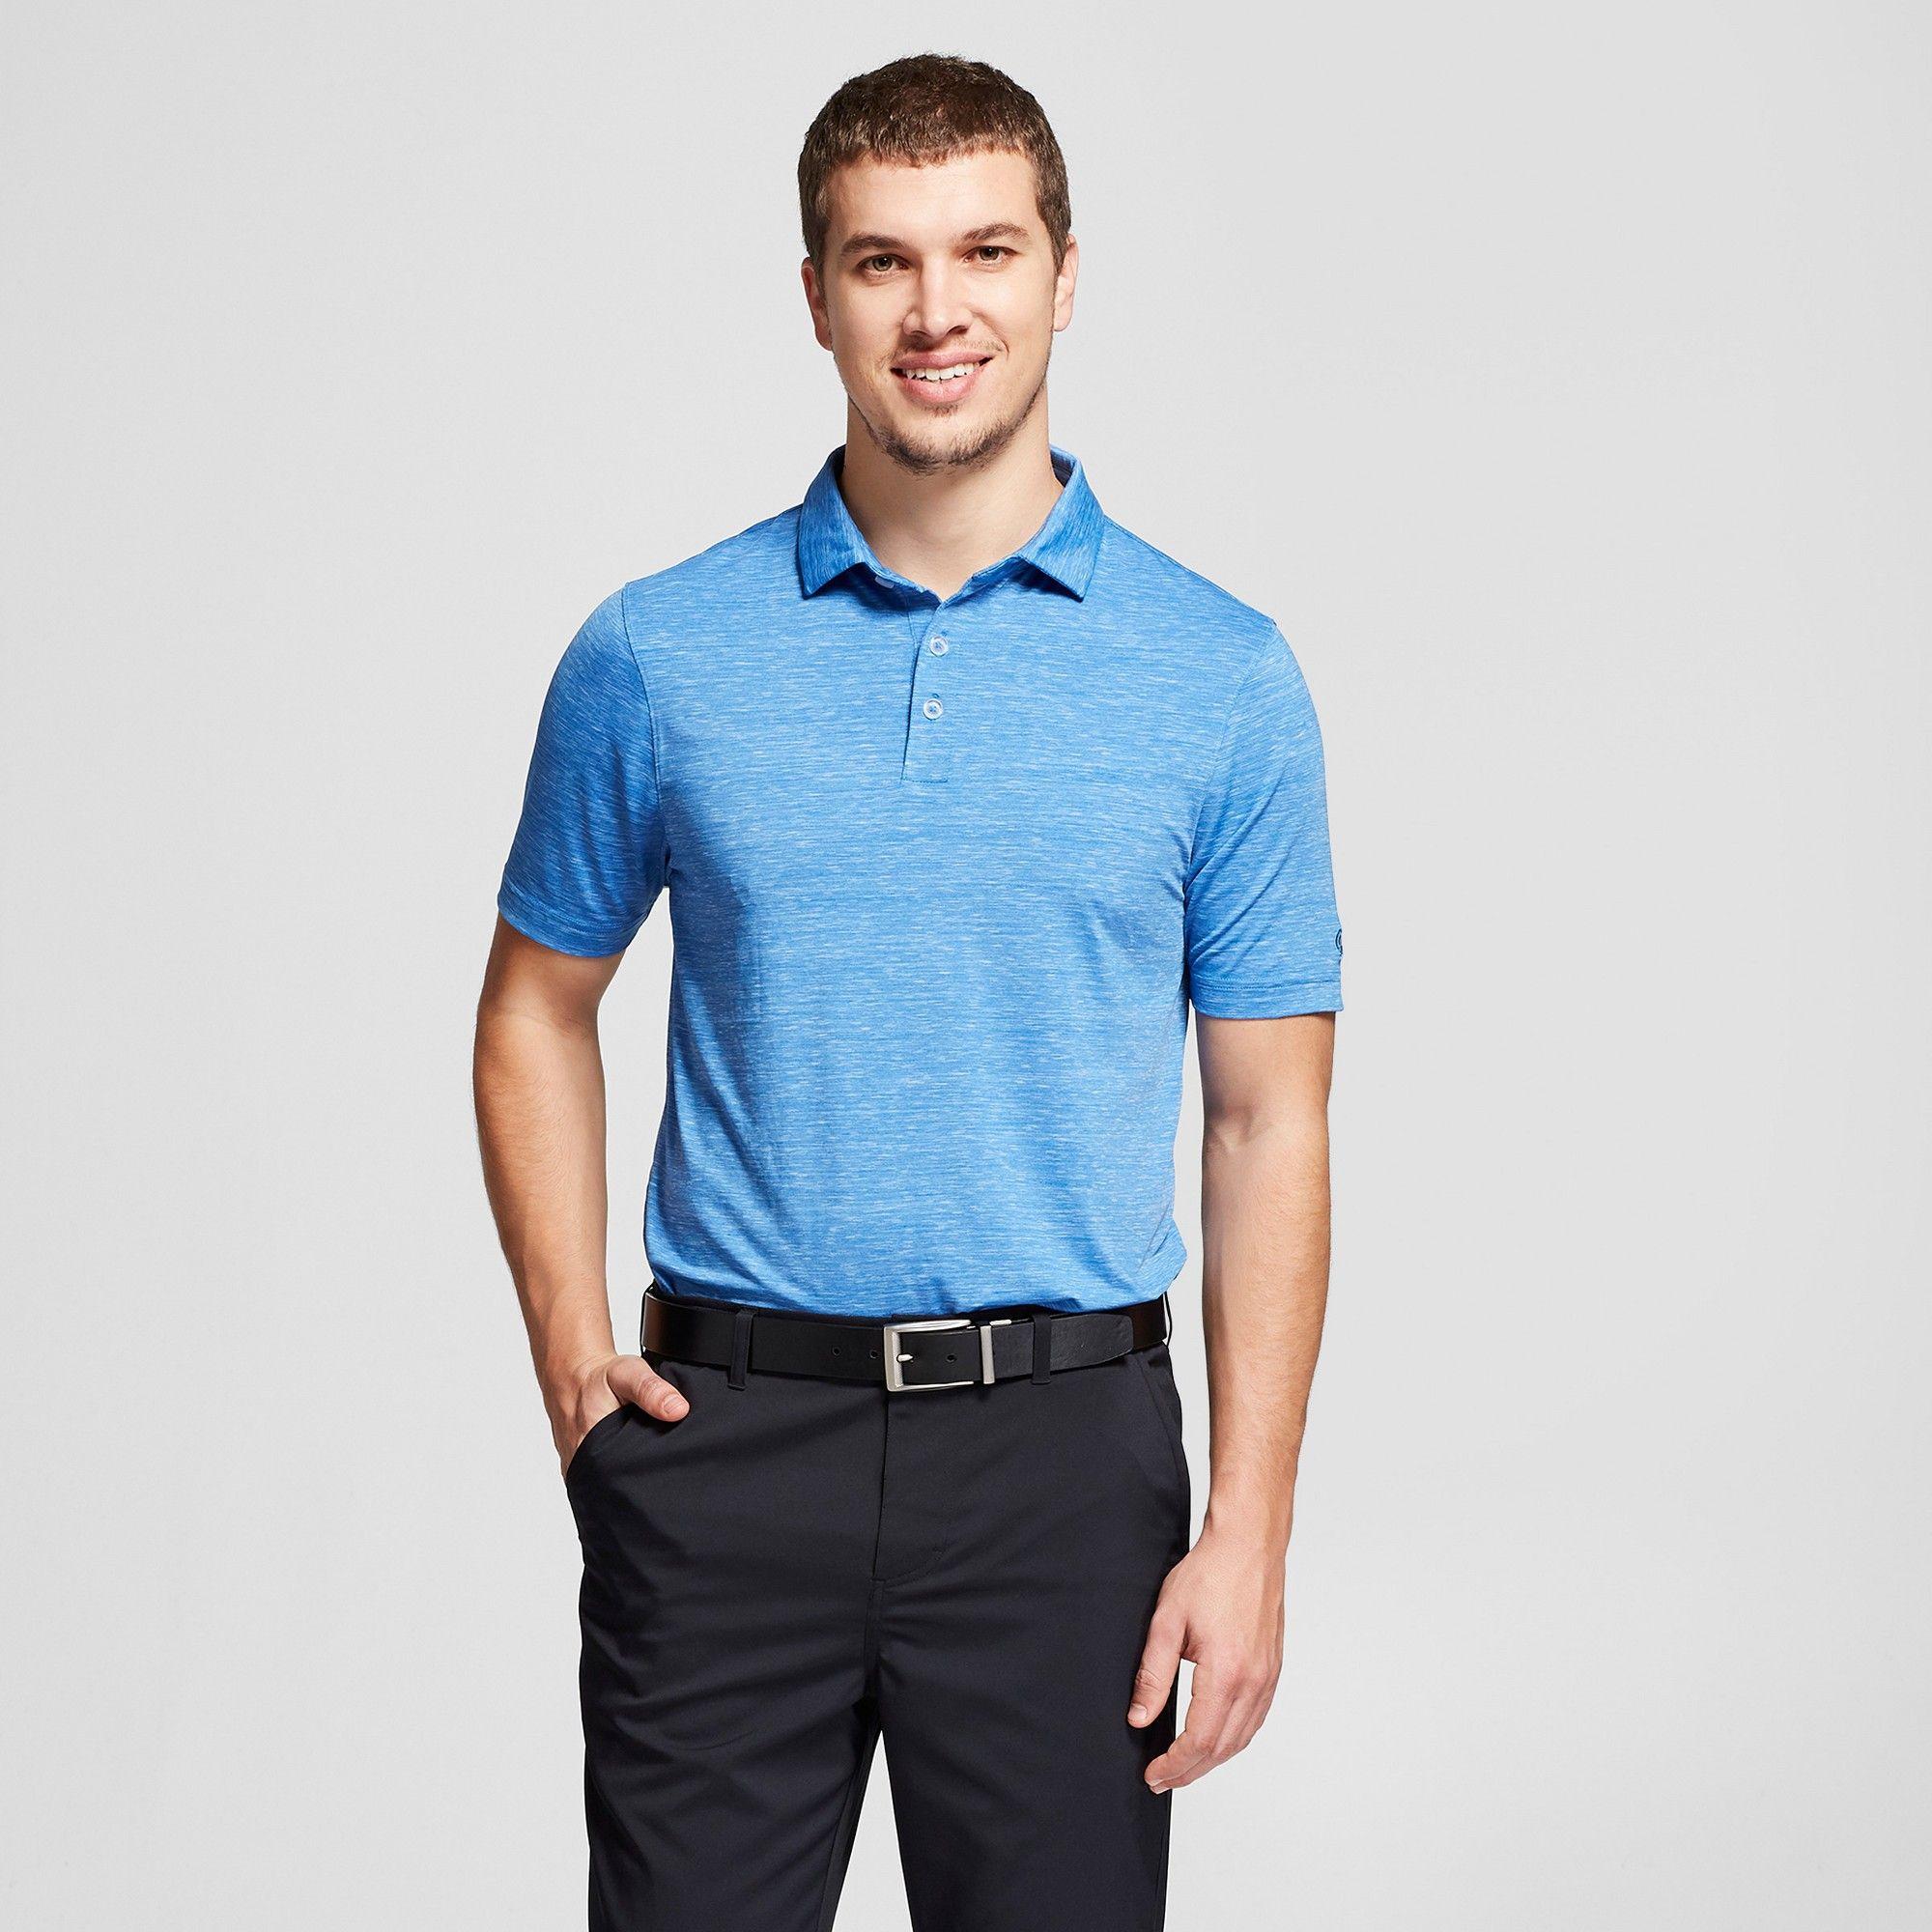 df5142bf3 Men's Spacedye Tech Polo Shirt - C9 Champion Summer Sky Blue Xxl ...